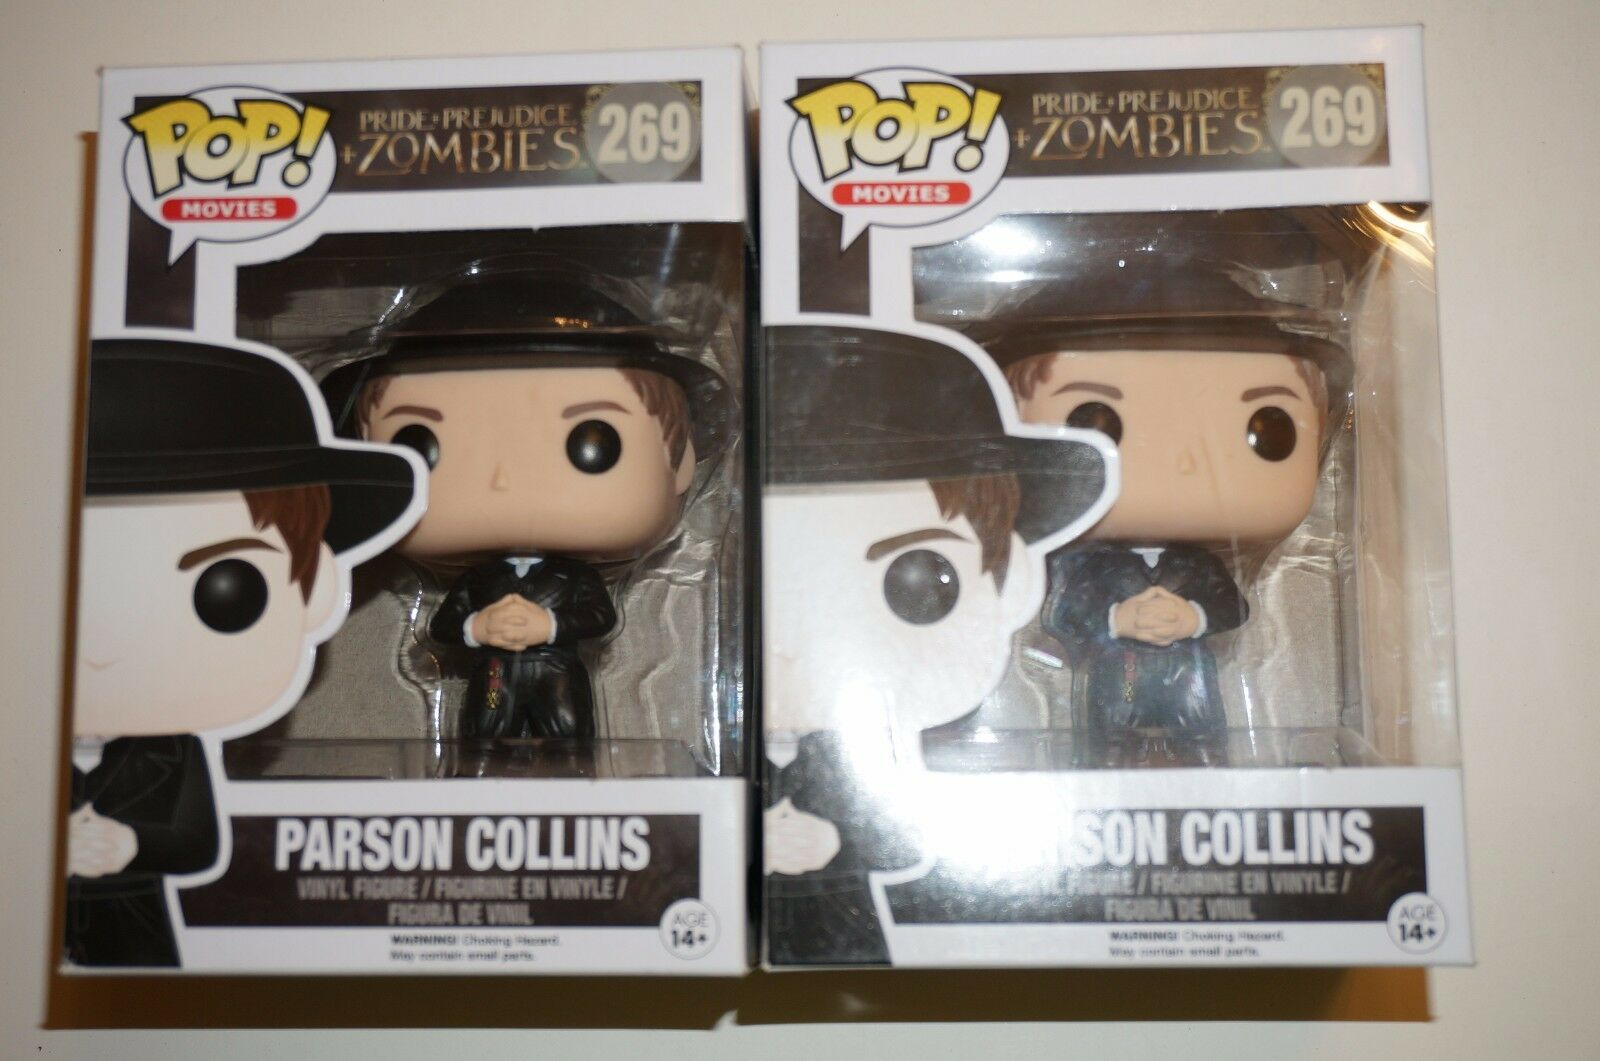 Pop Movies Pride Prejudice Zombies 269 Parson Collins figure Funko 75729